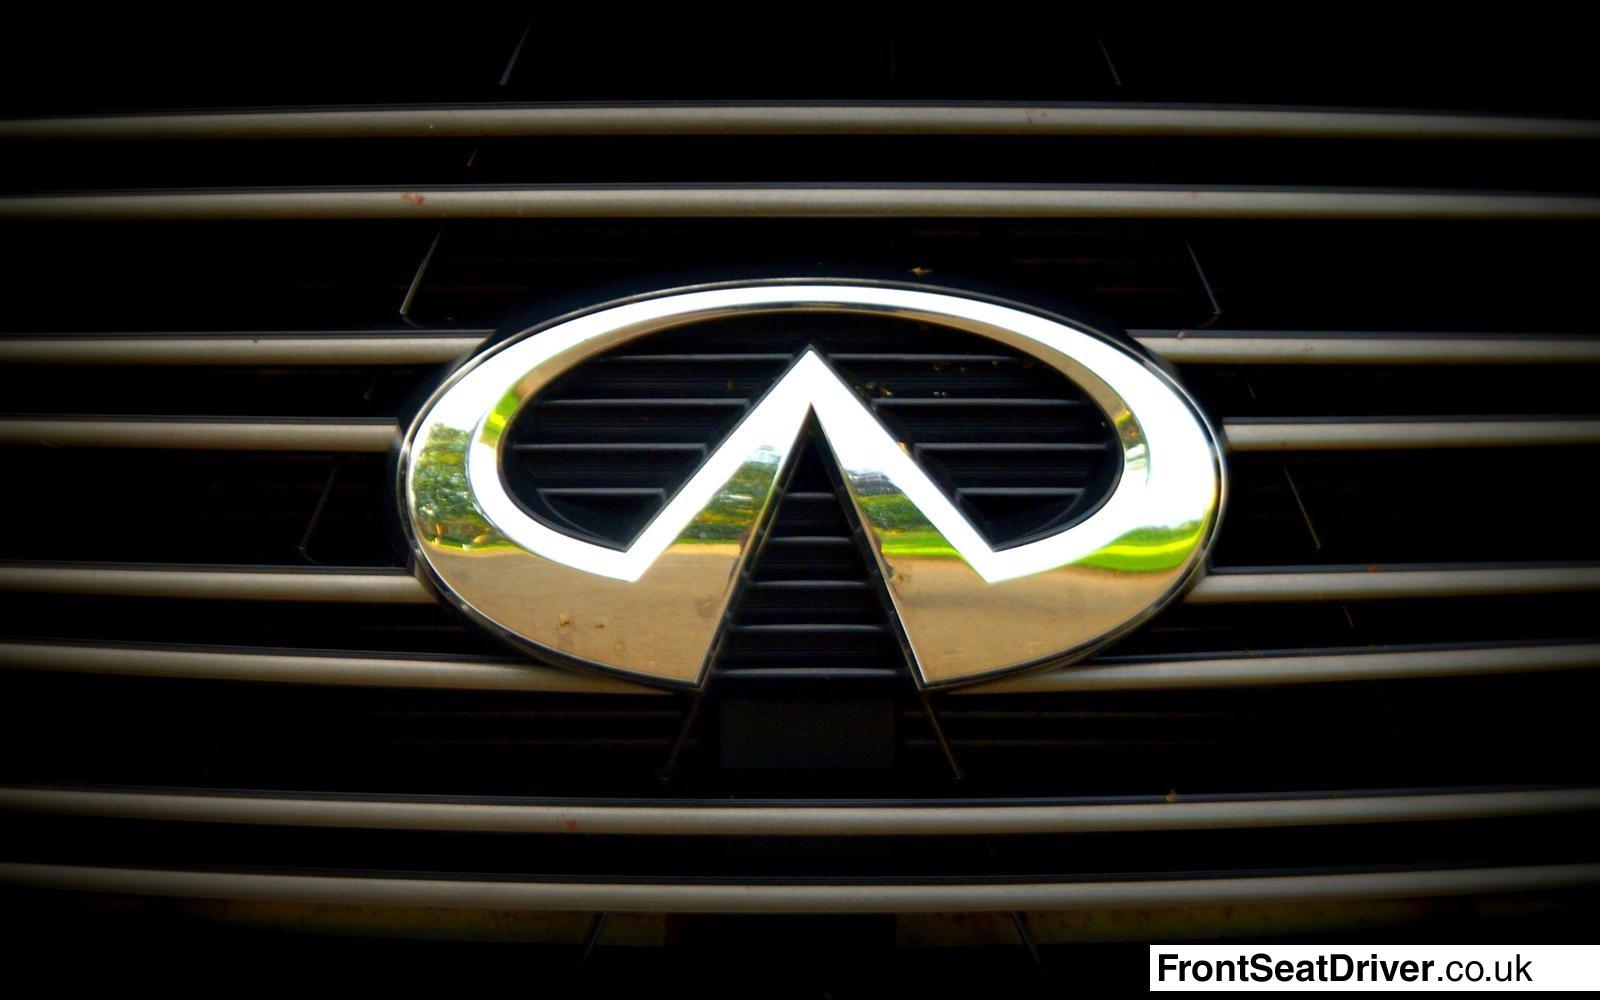 Infiniti M35h 2012 Grille Emblem Front Seat Driver